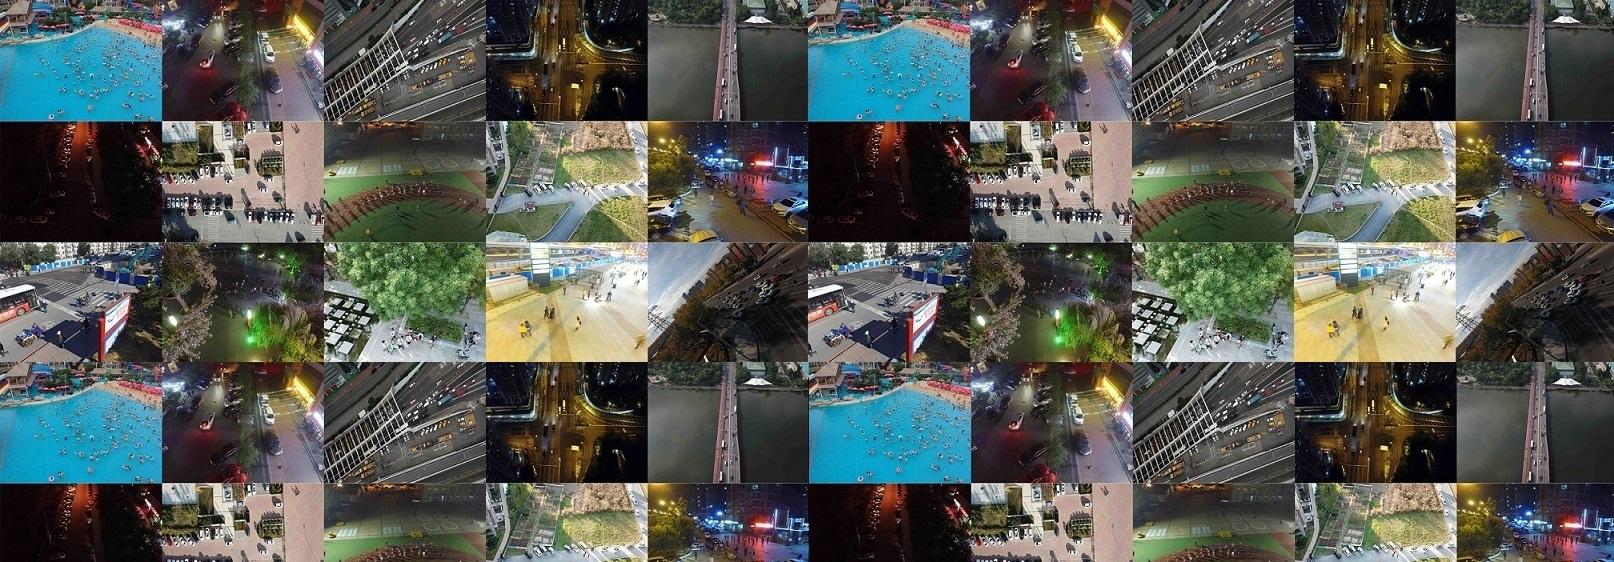 Vision Meets Drones: A Challenge